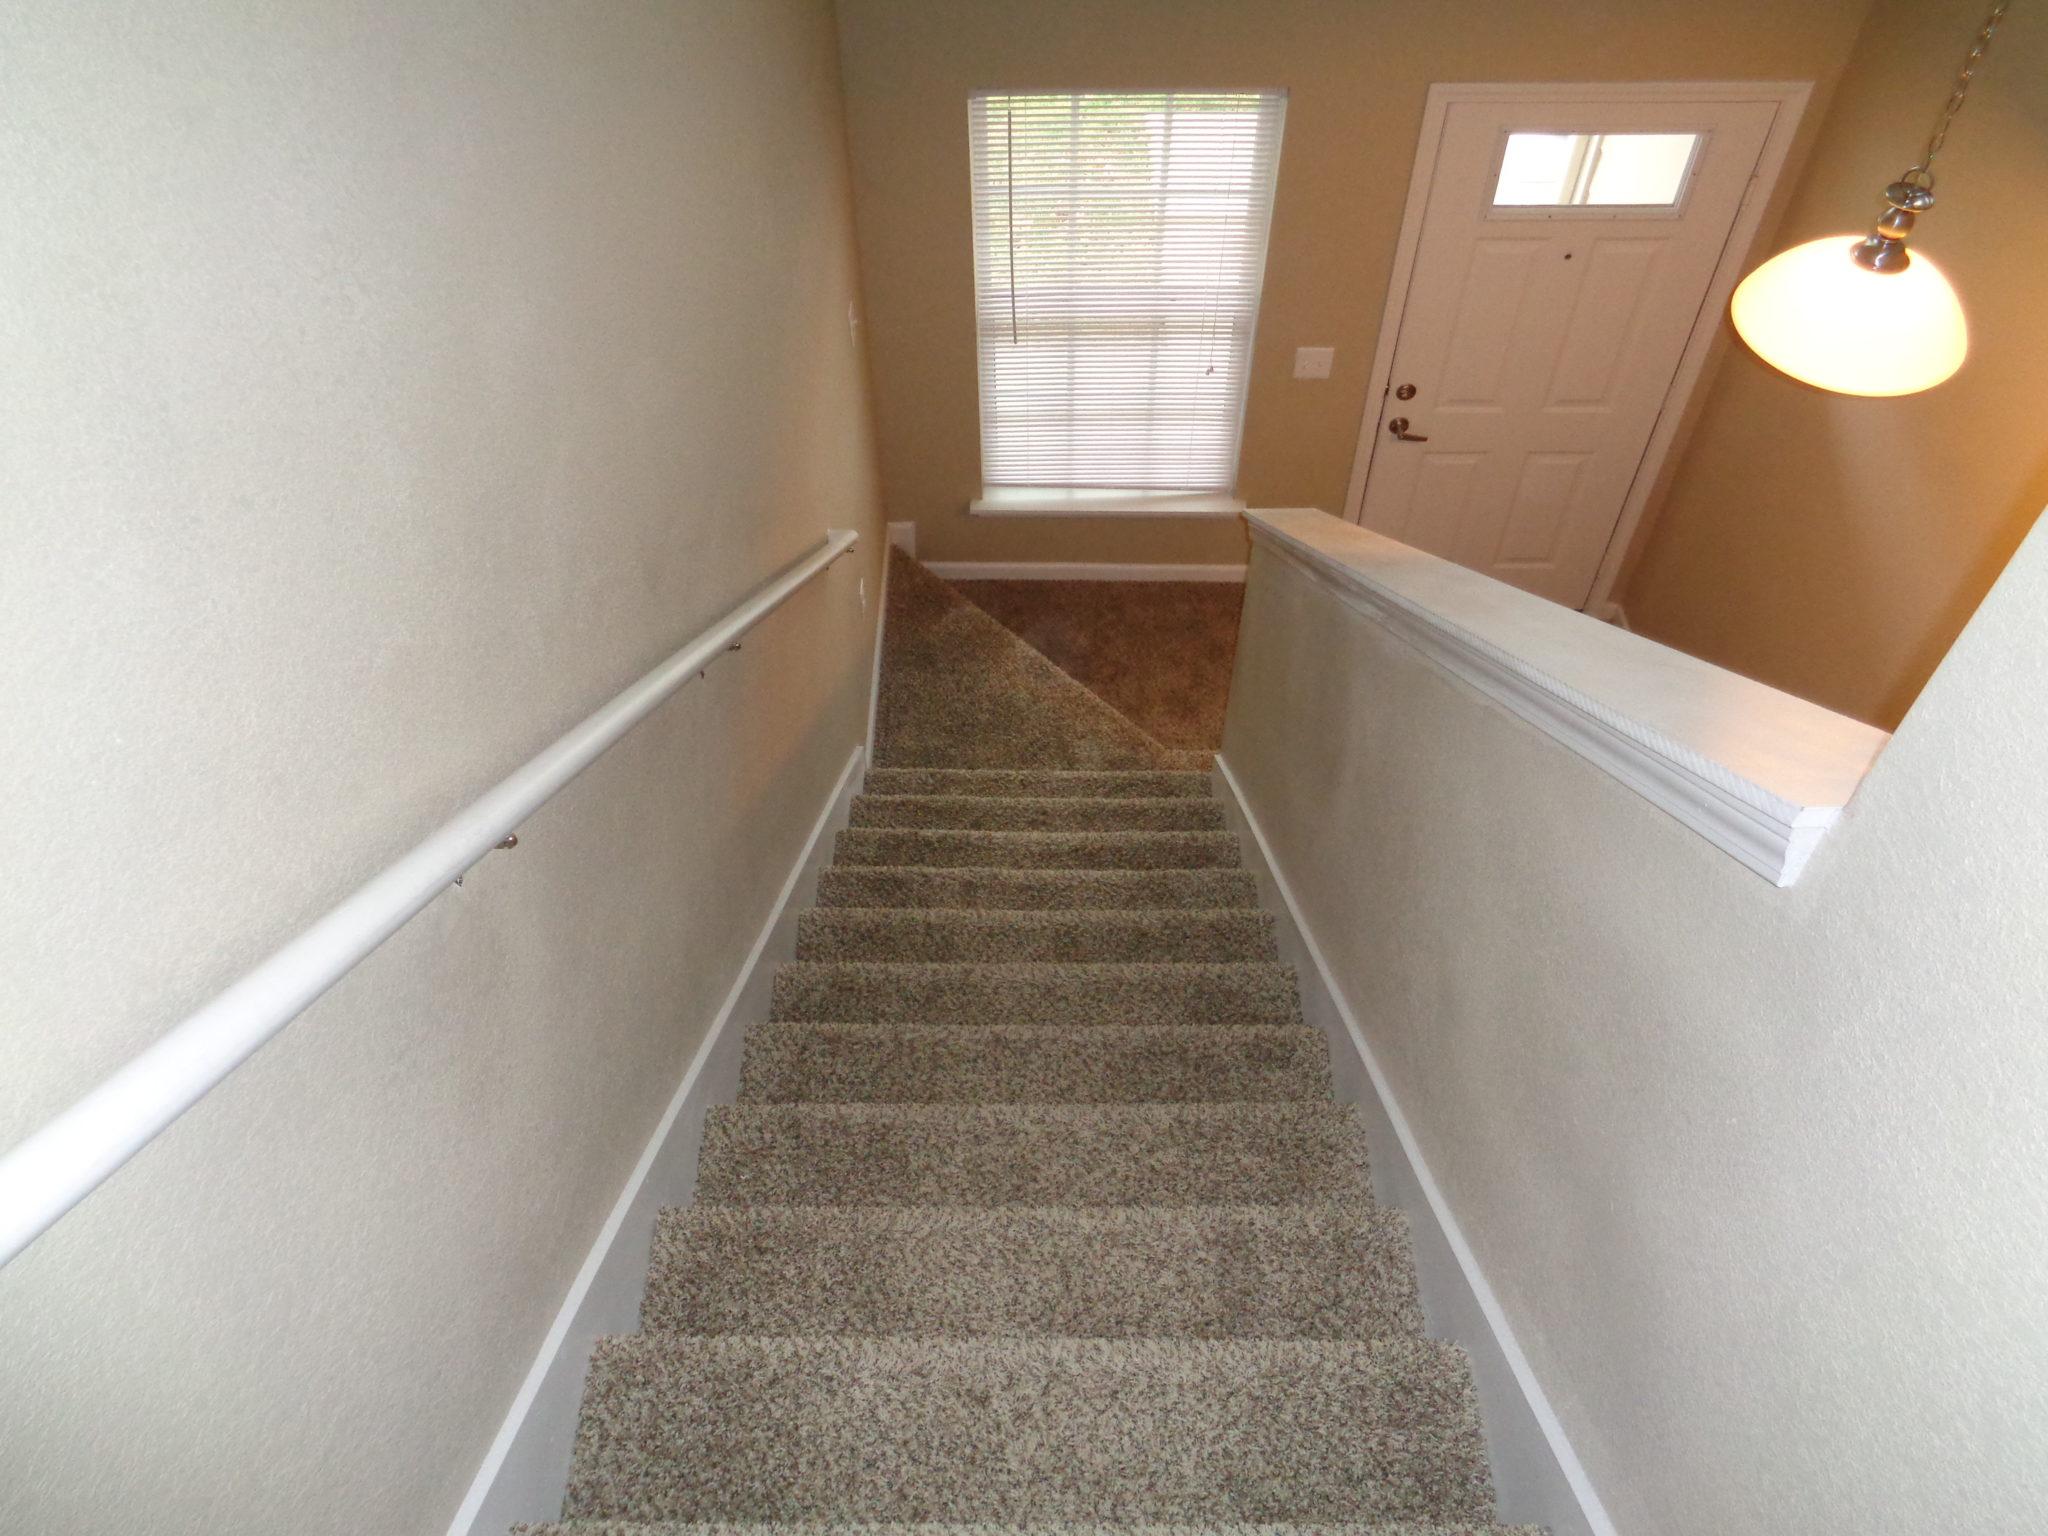 Ridgway Villas Raymore MO staircase